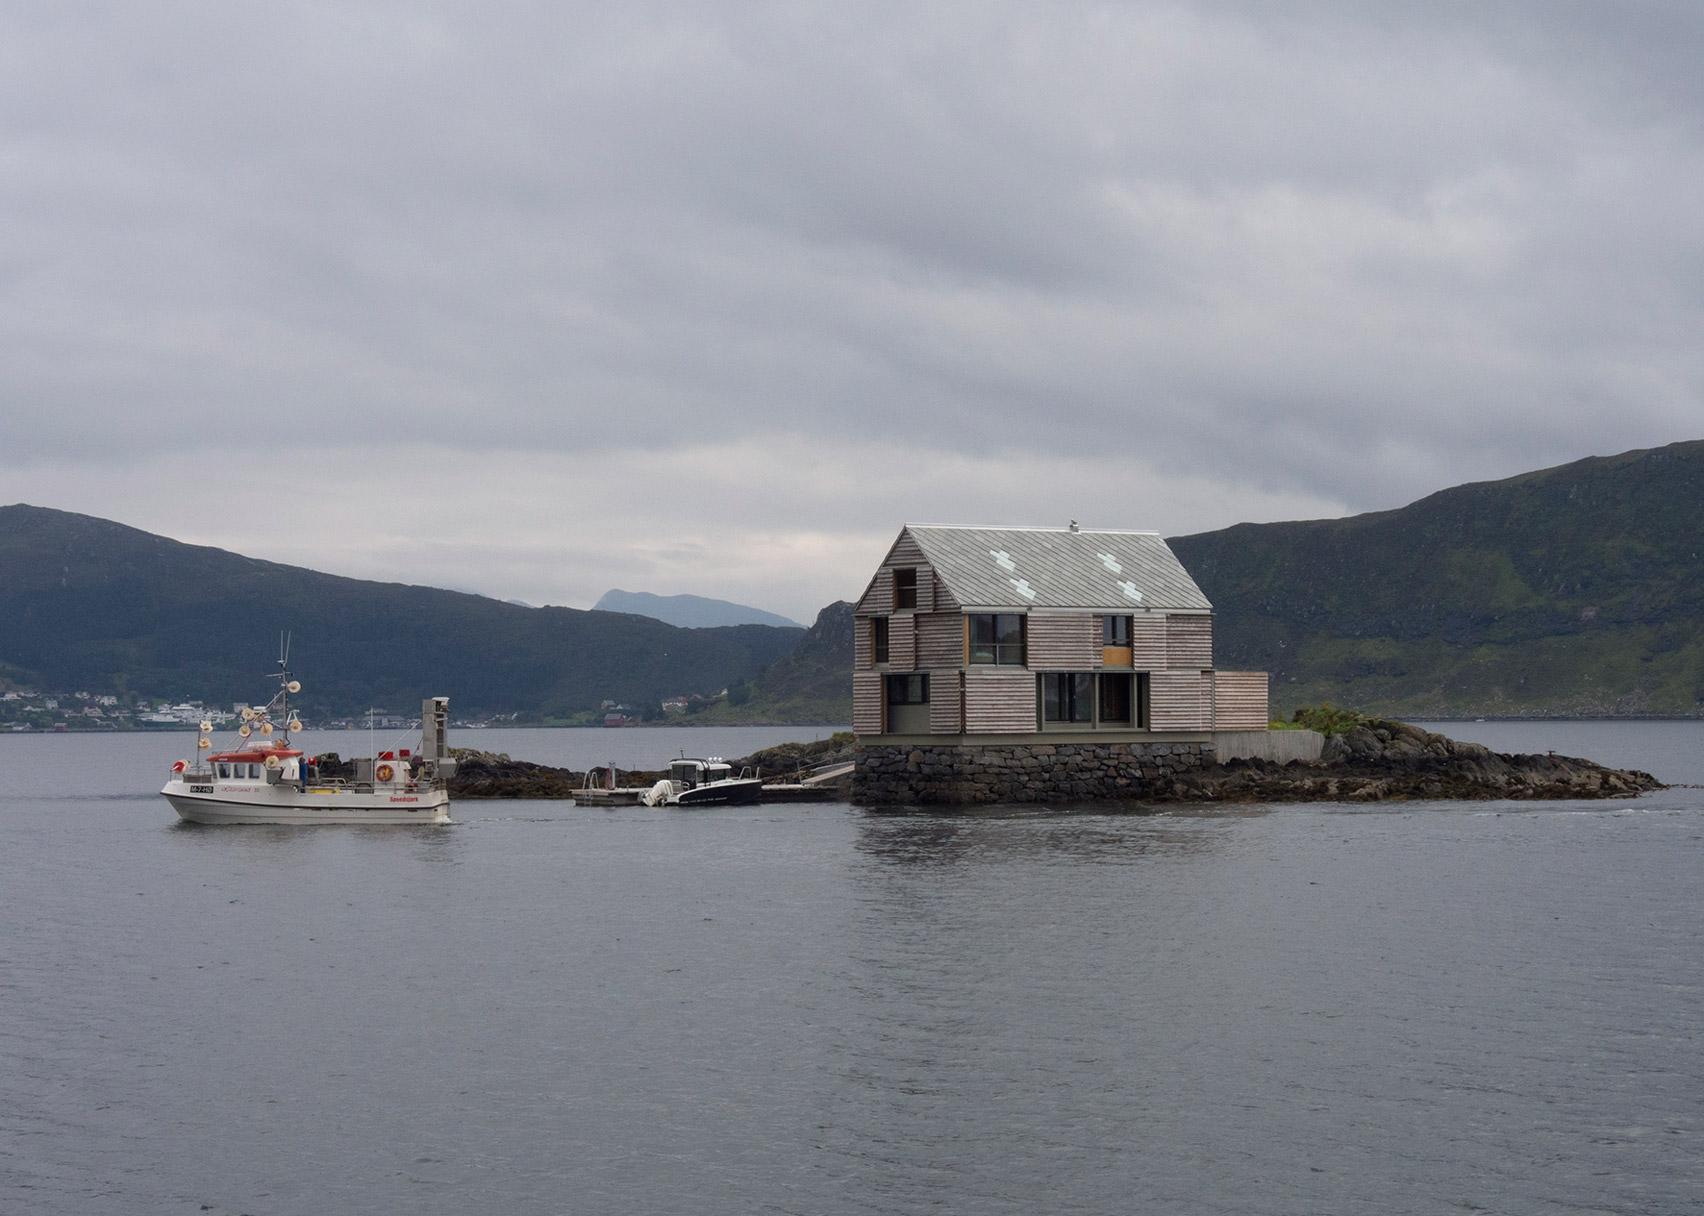 Weekend House at Sildegarnsholmen, Herøy, by Knut Hjeltnes AS Sivilarkitekter MNAL